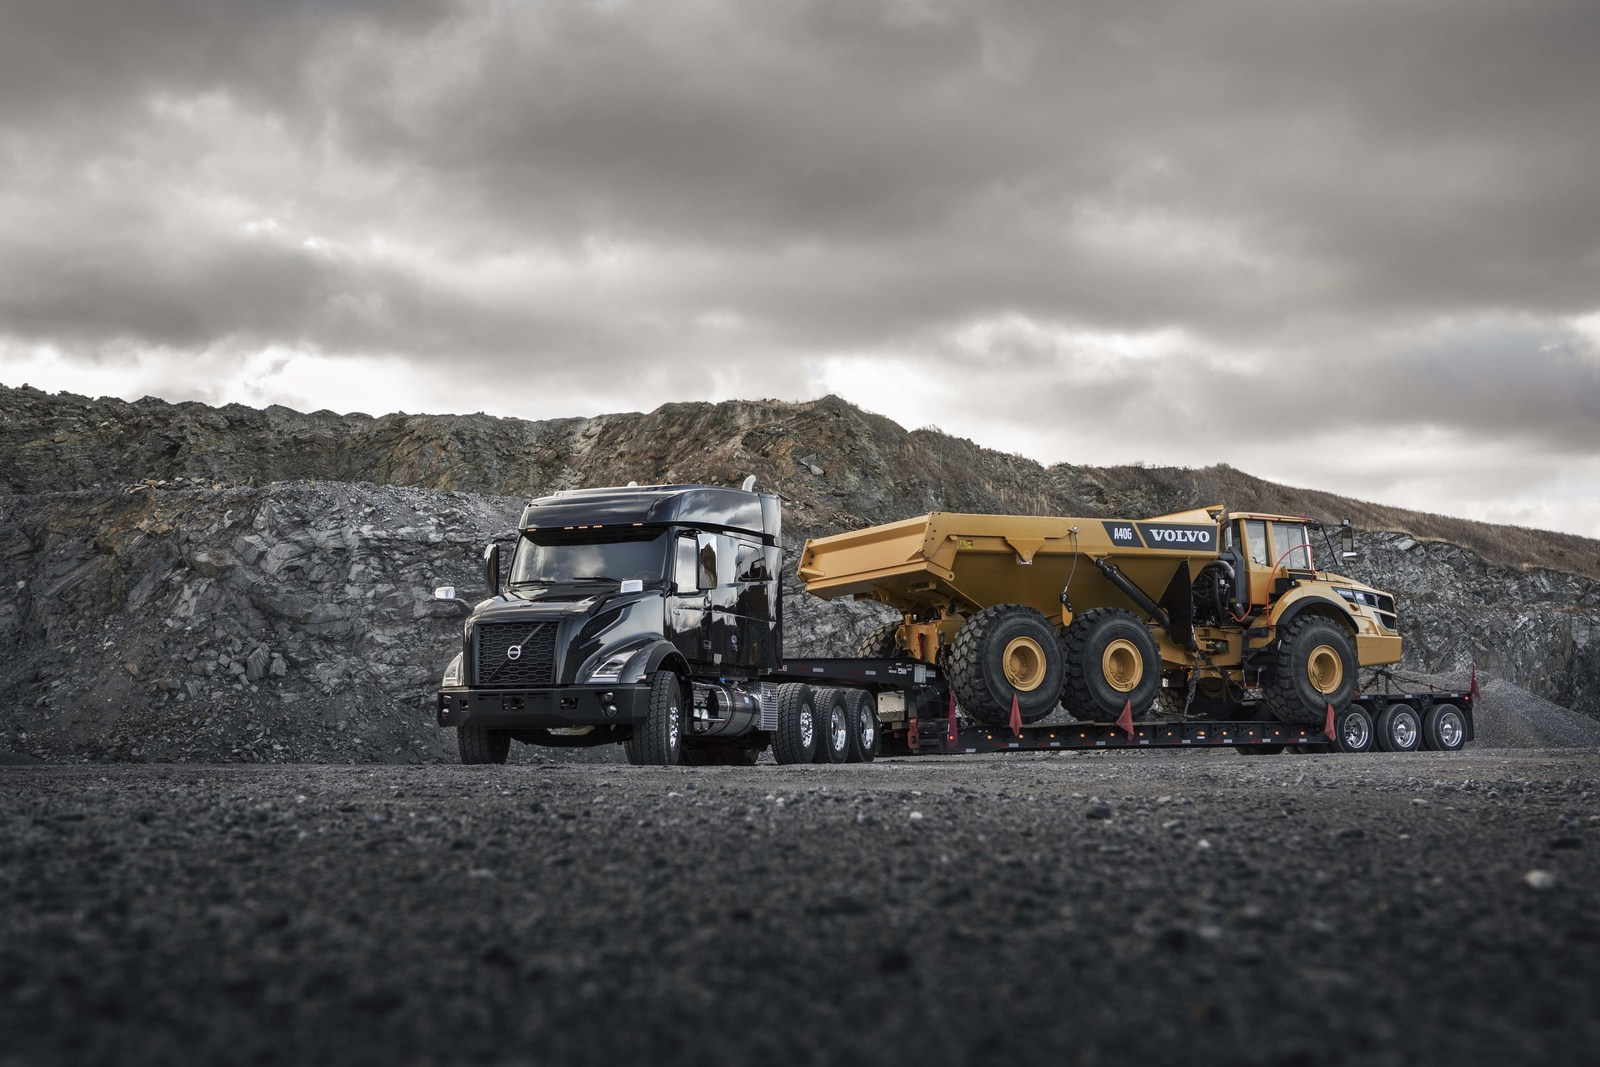 Volvo VNX Heavy-haul Tractor, VNX heavy-haul tractor model hauling heavy equipment